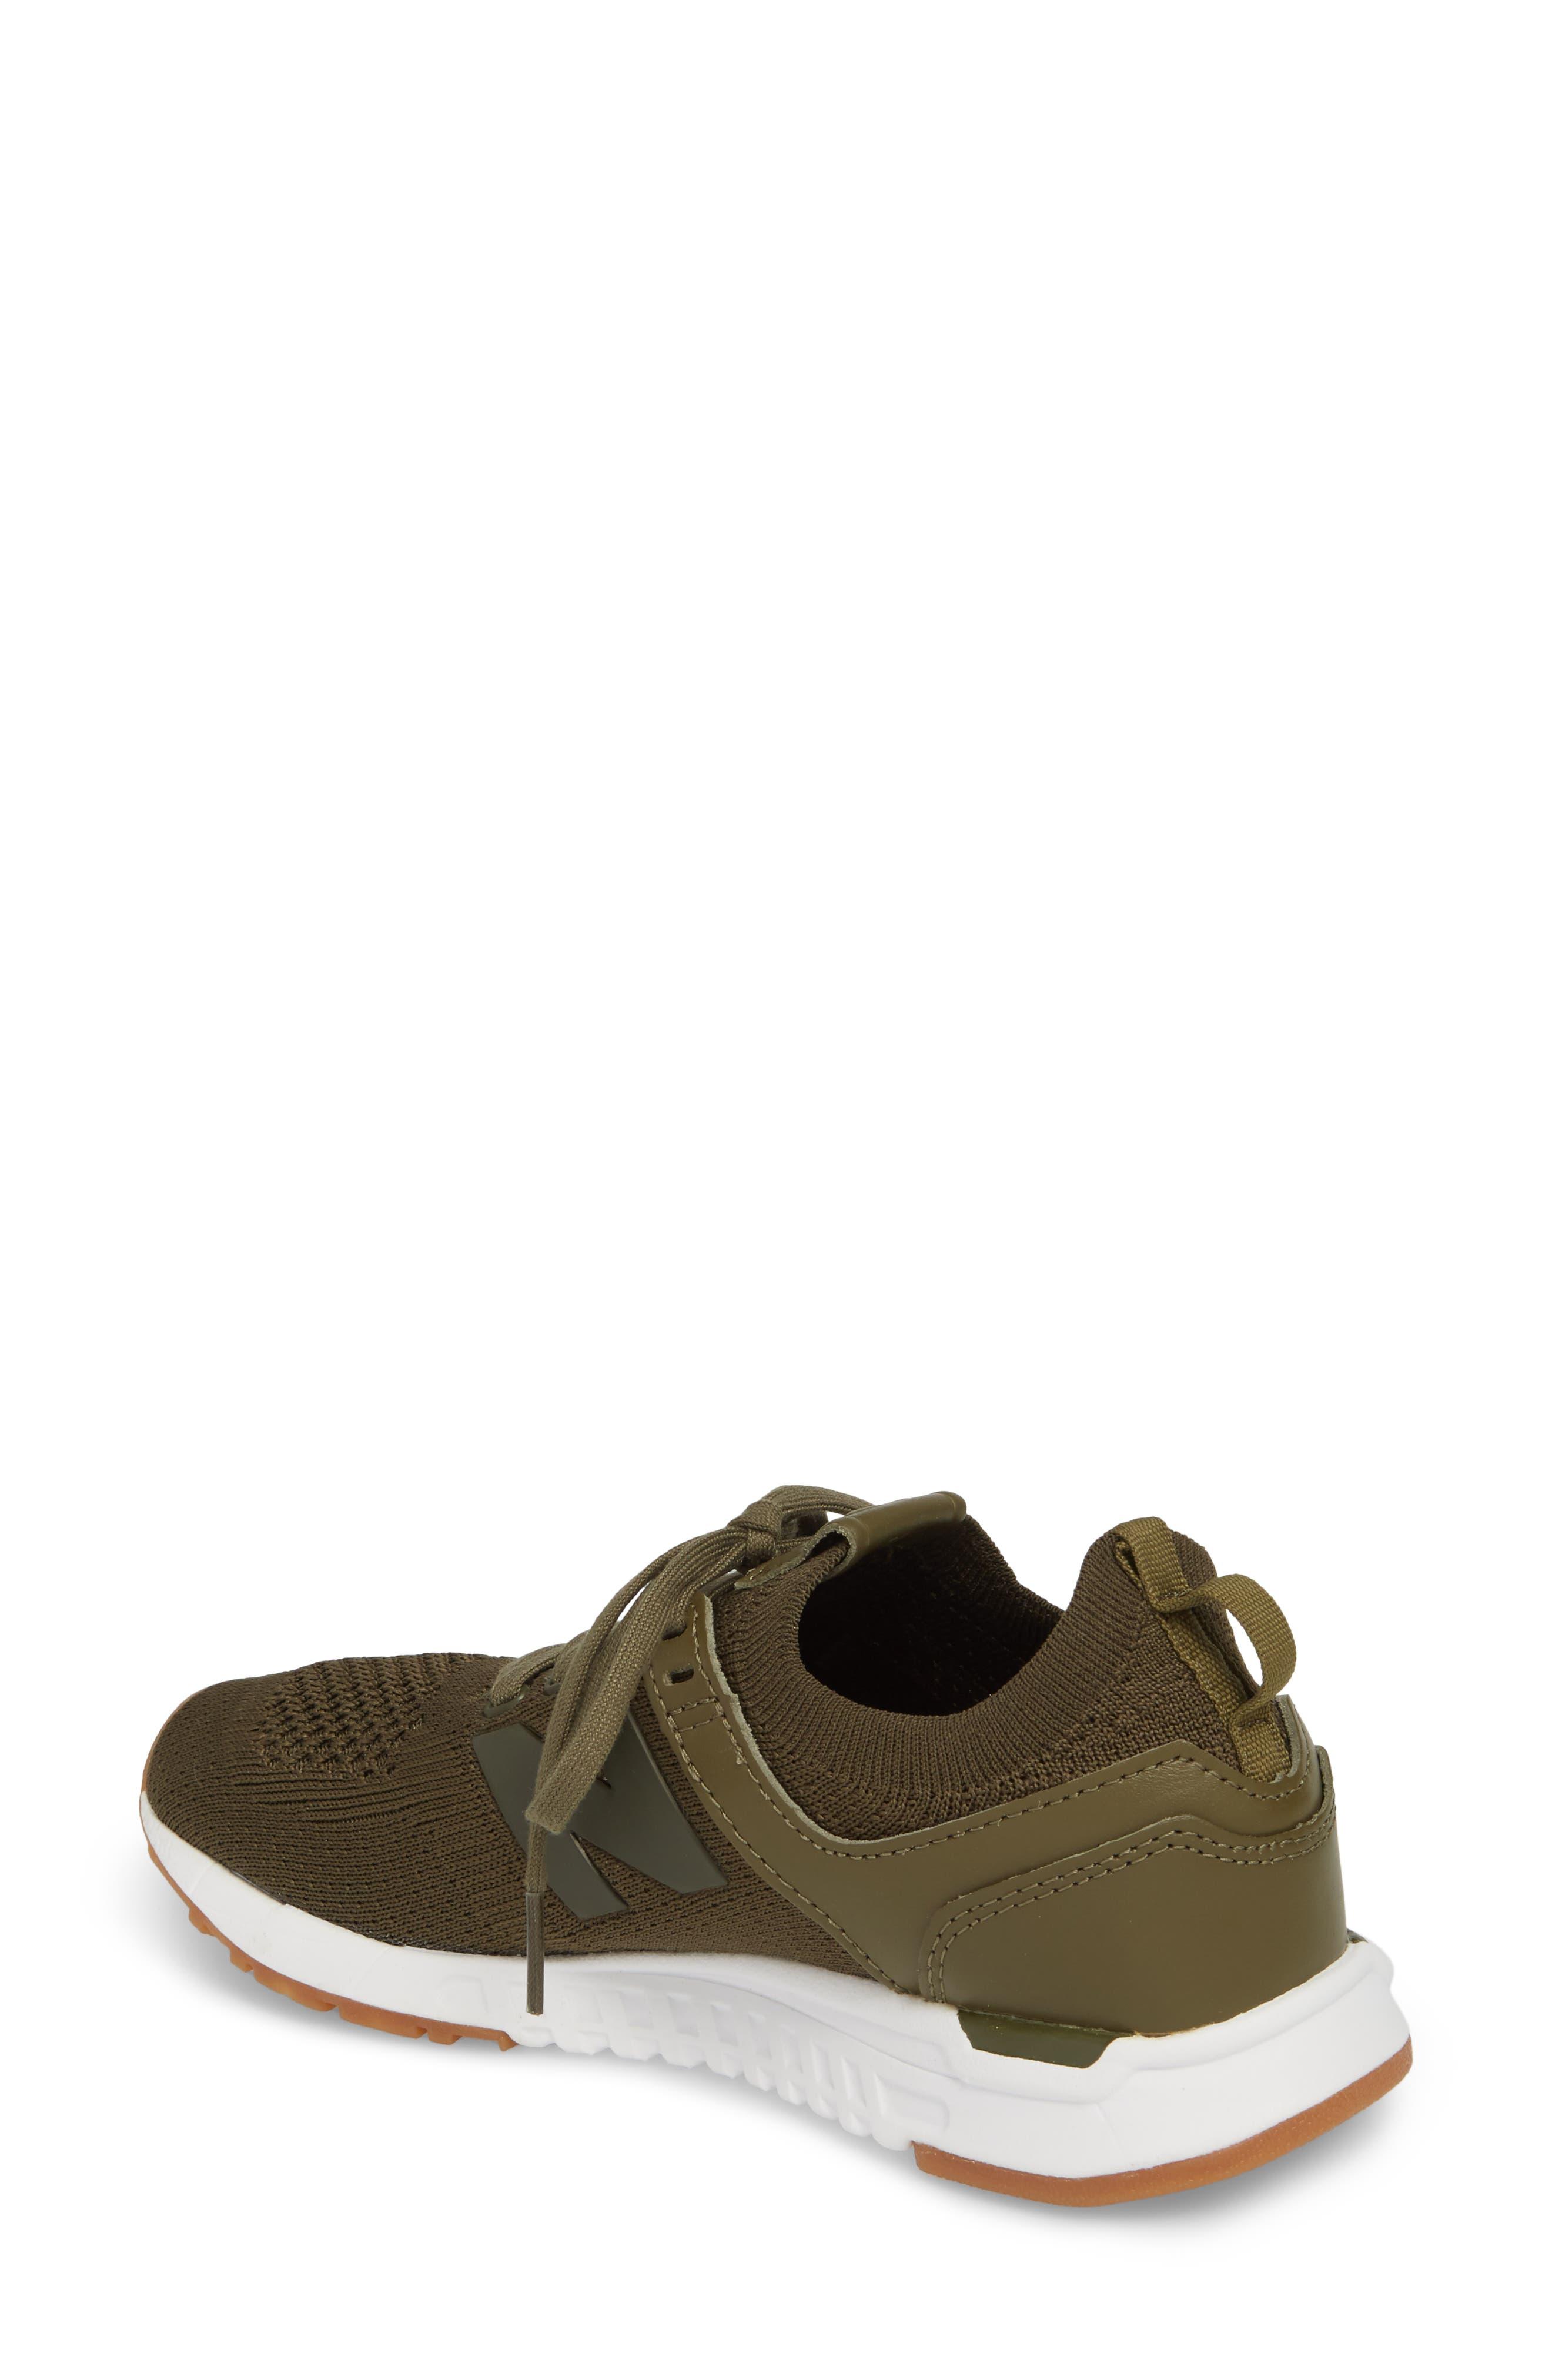 247 Decon Knit Sneaker,                             Alternate thumbnail 6, color,